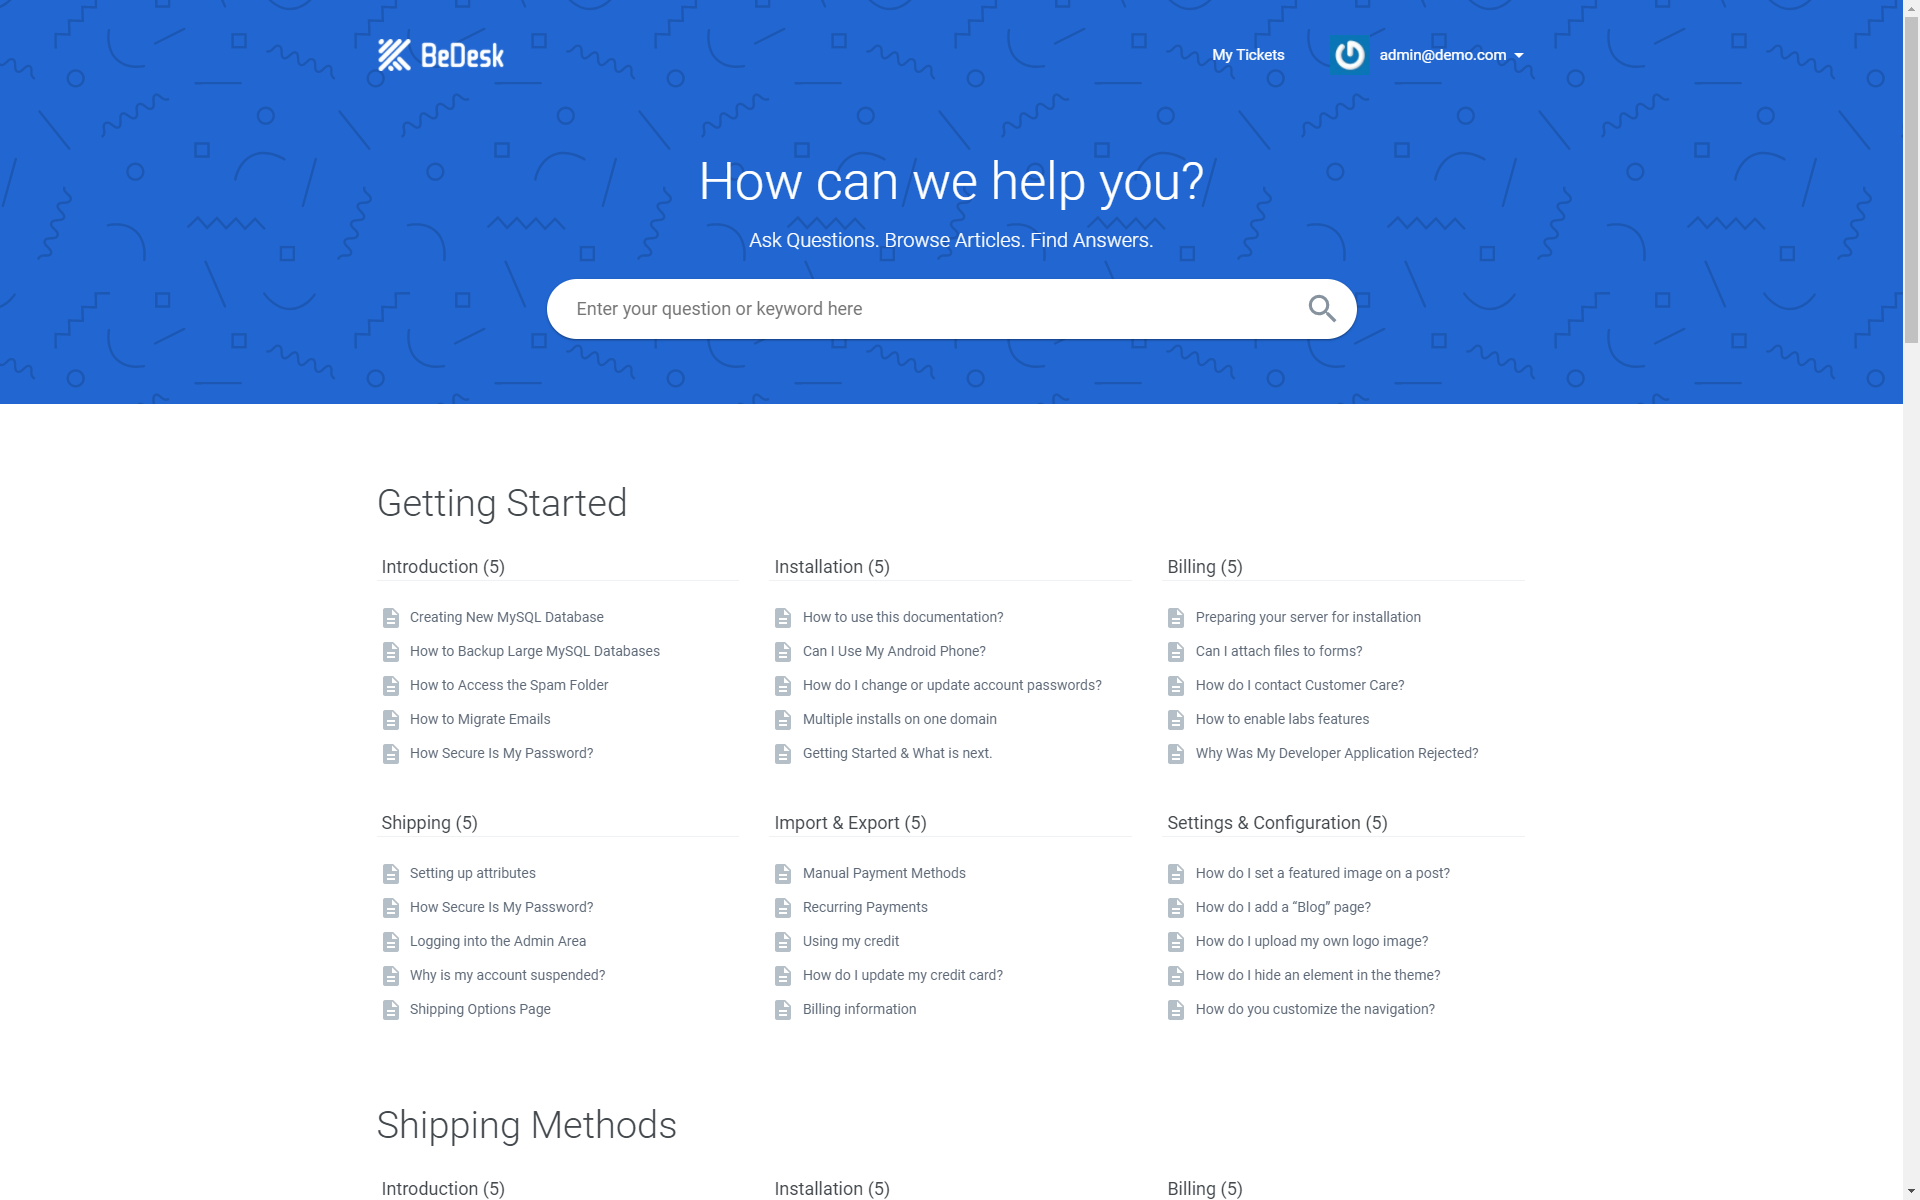 BeDesk - Customer Support Software & Helpdesk Ticketing System by Vebto